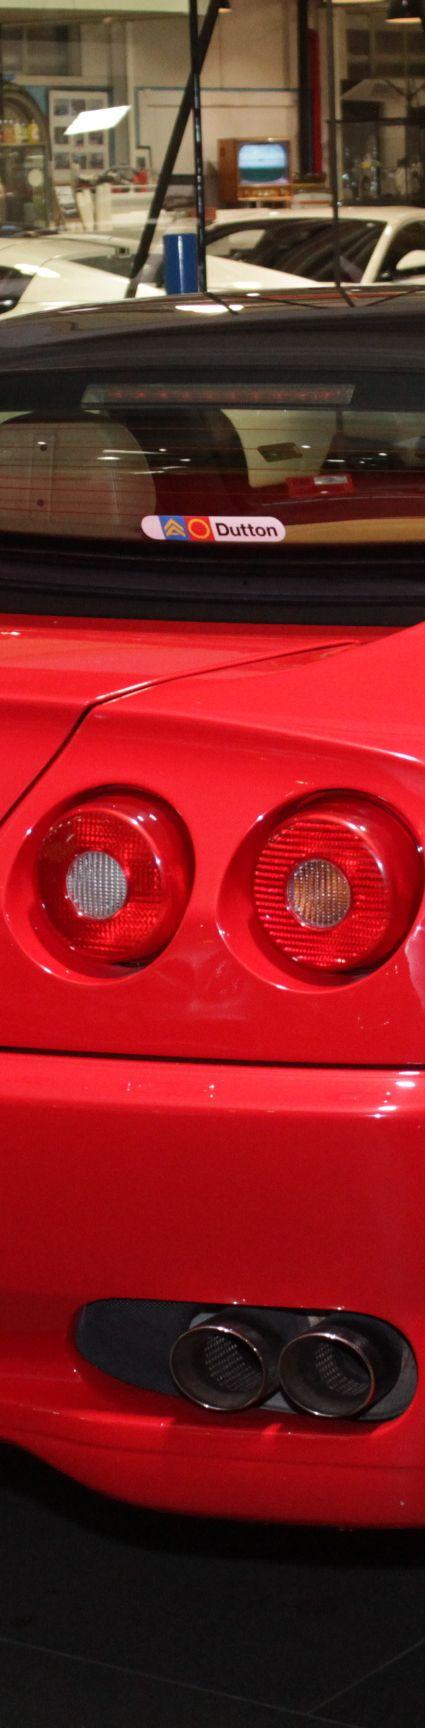 2006 Ferrari Superamerica 575 Convertible 2dr Man 6sp 5.7i for sale at Dutton garage Richmond Melbourne Australia classic car dealership